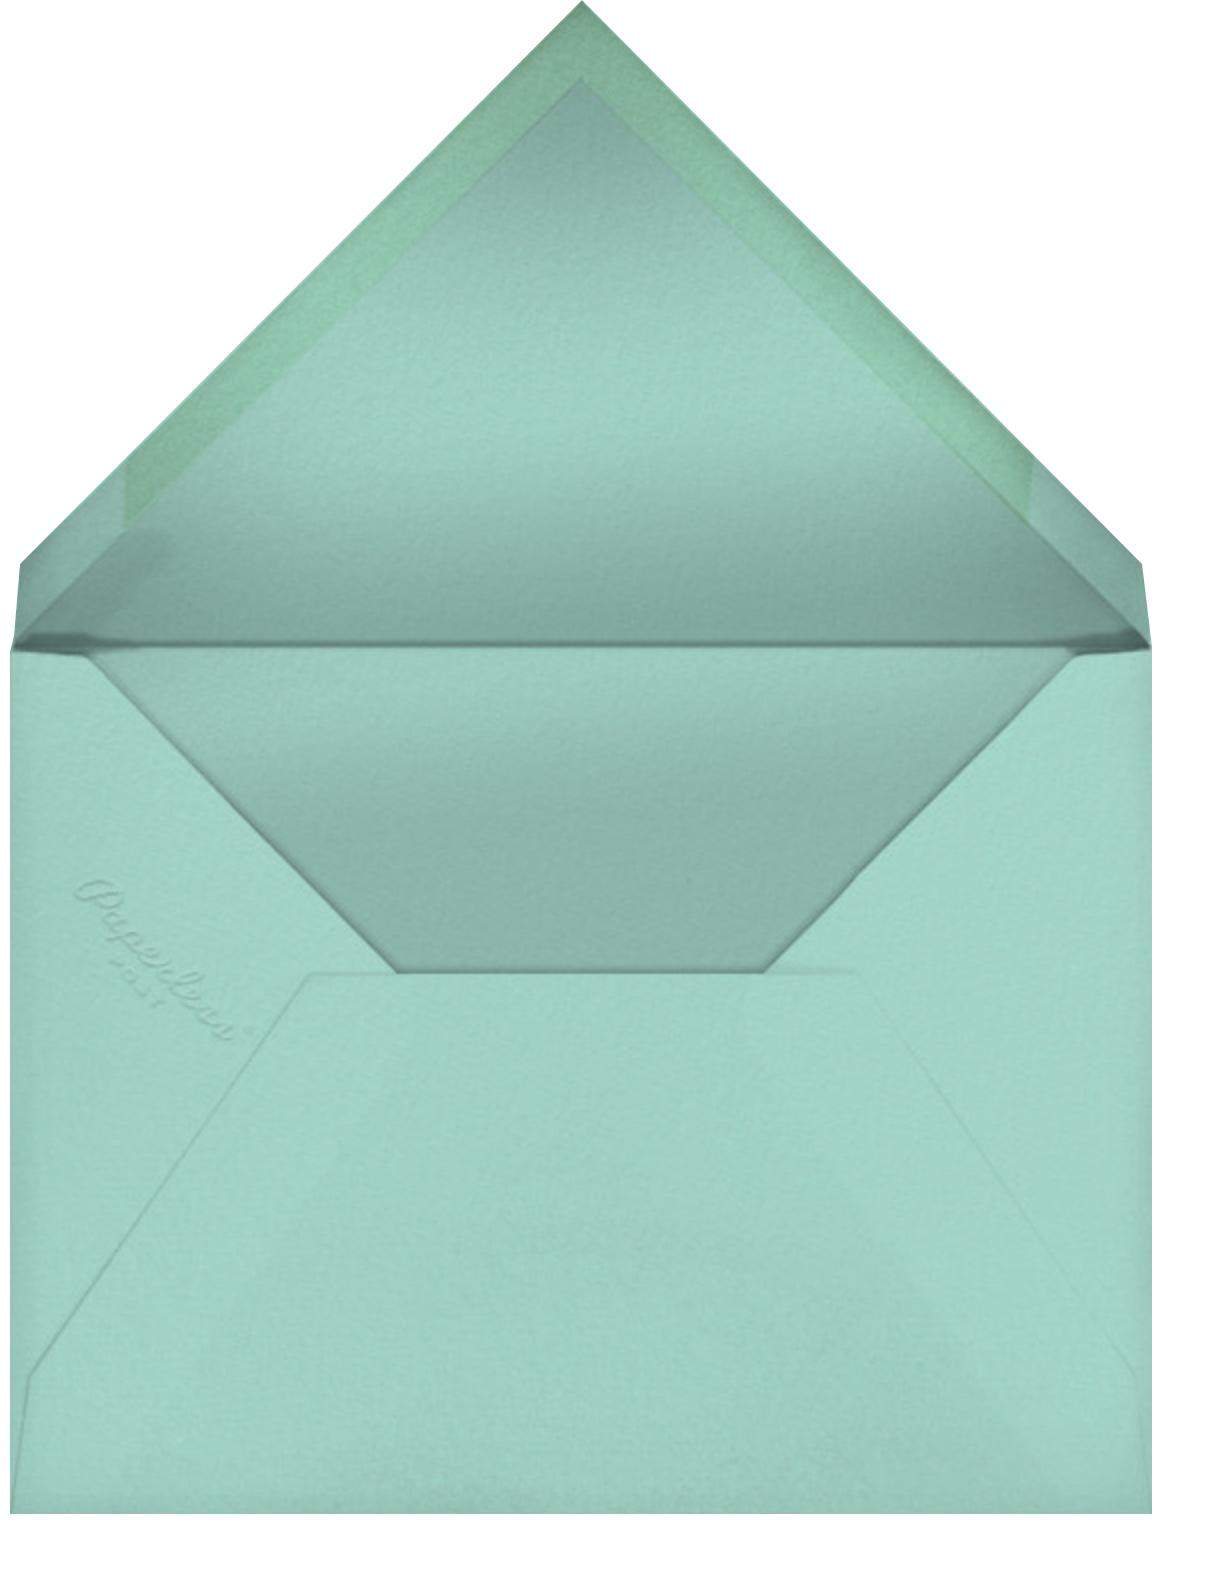 Prickly Pals - Little Cube - Bachelorette party - envelope back